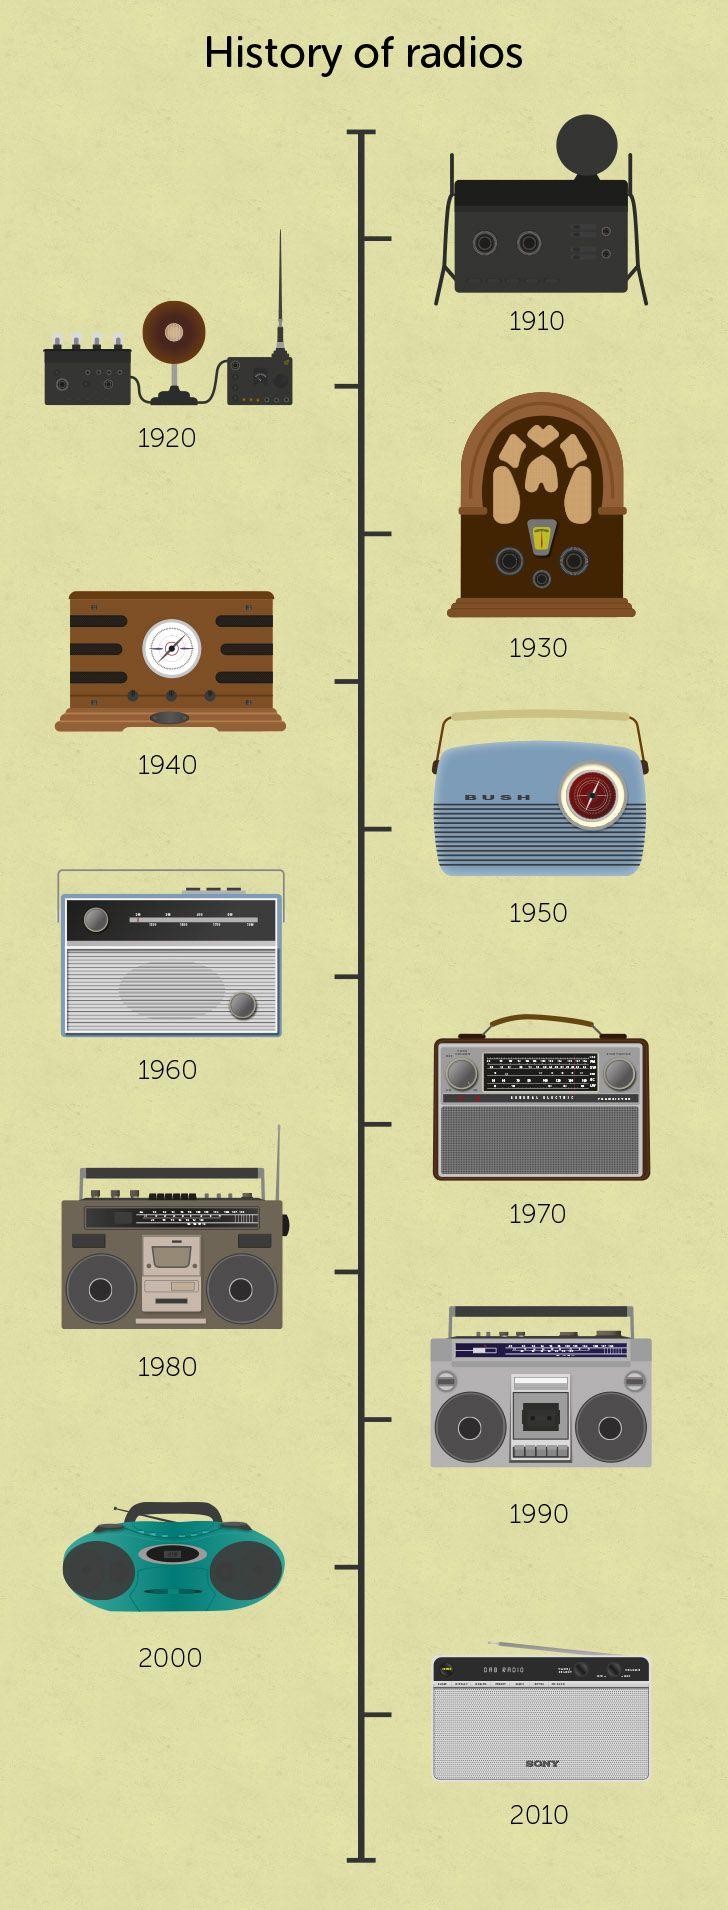 History of Radio Timeline - COM-336 History of Radio, Television and Internet - Library at Lynn University